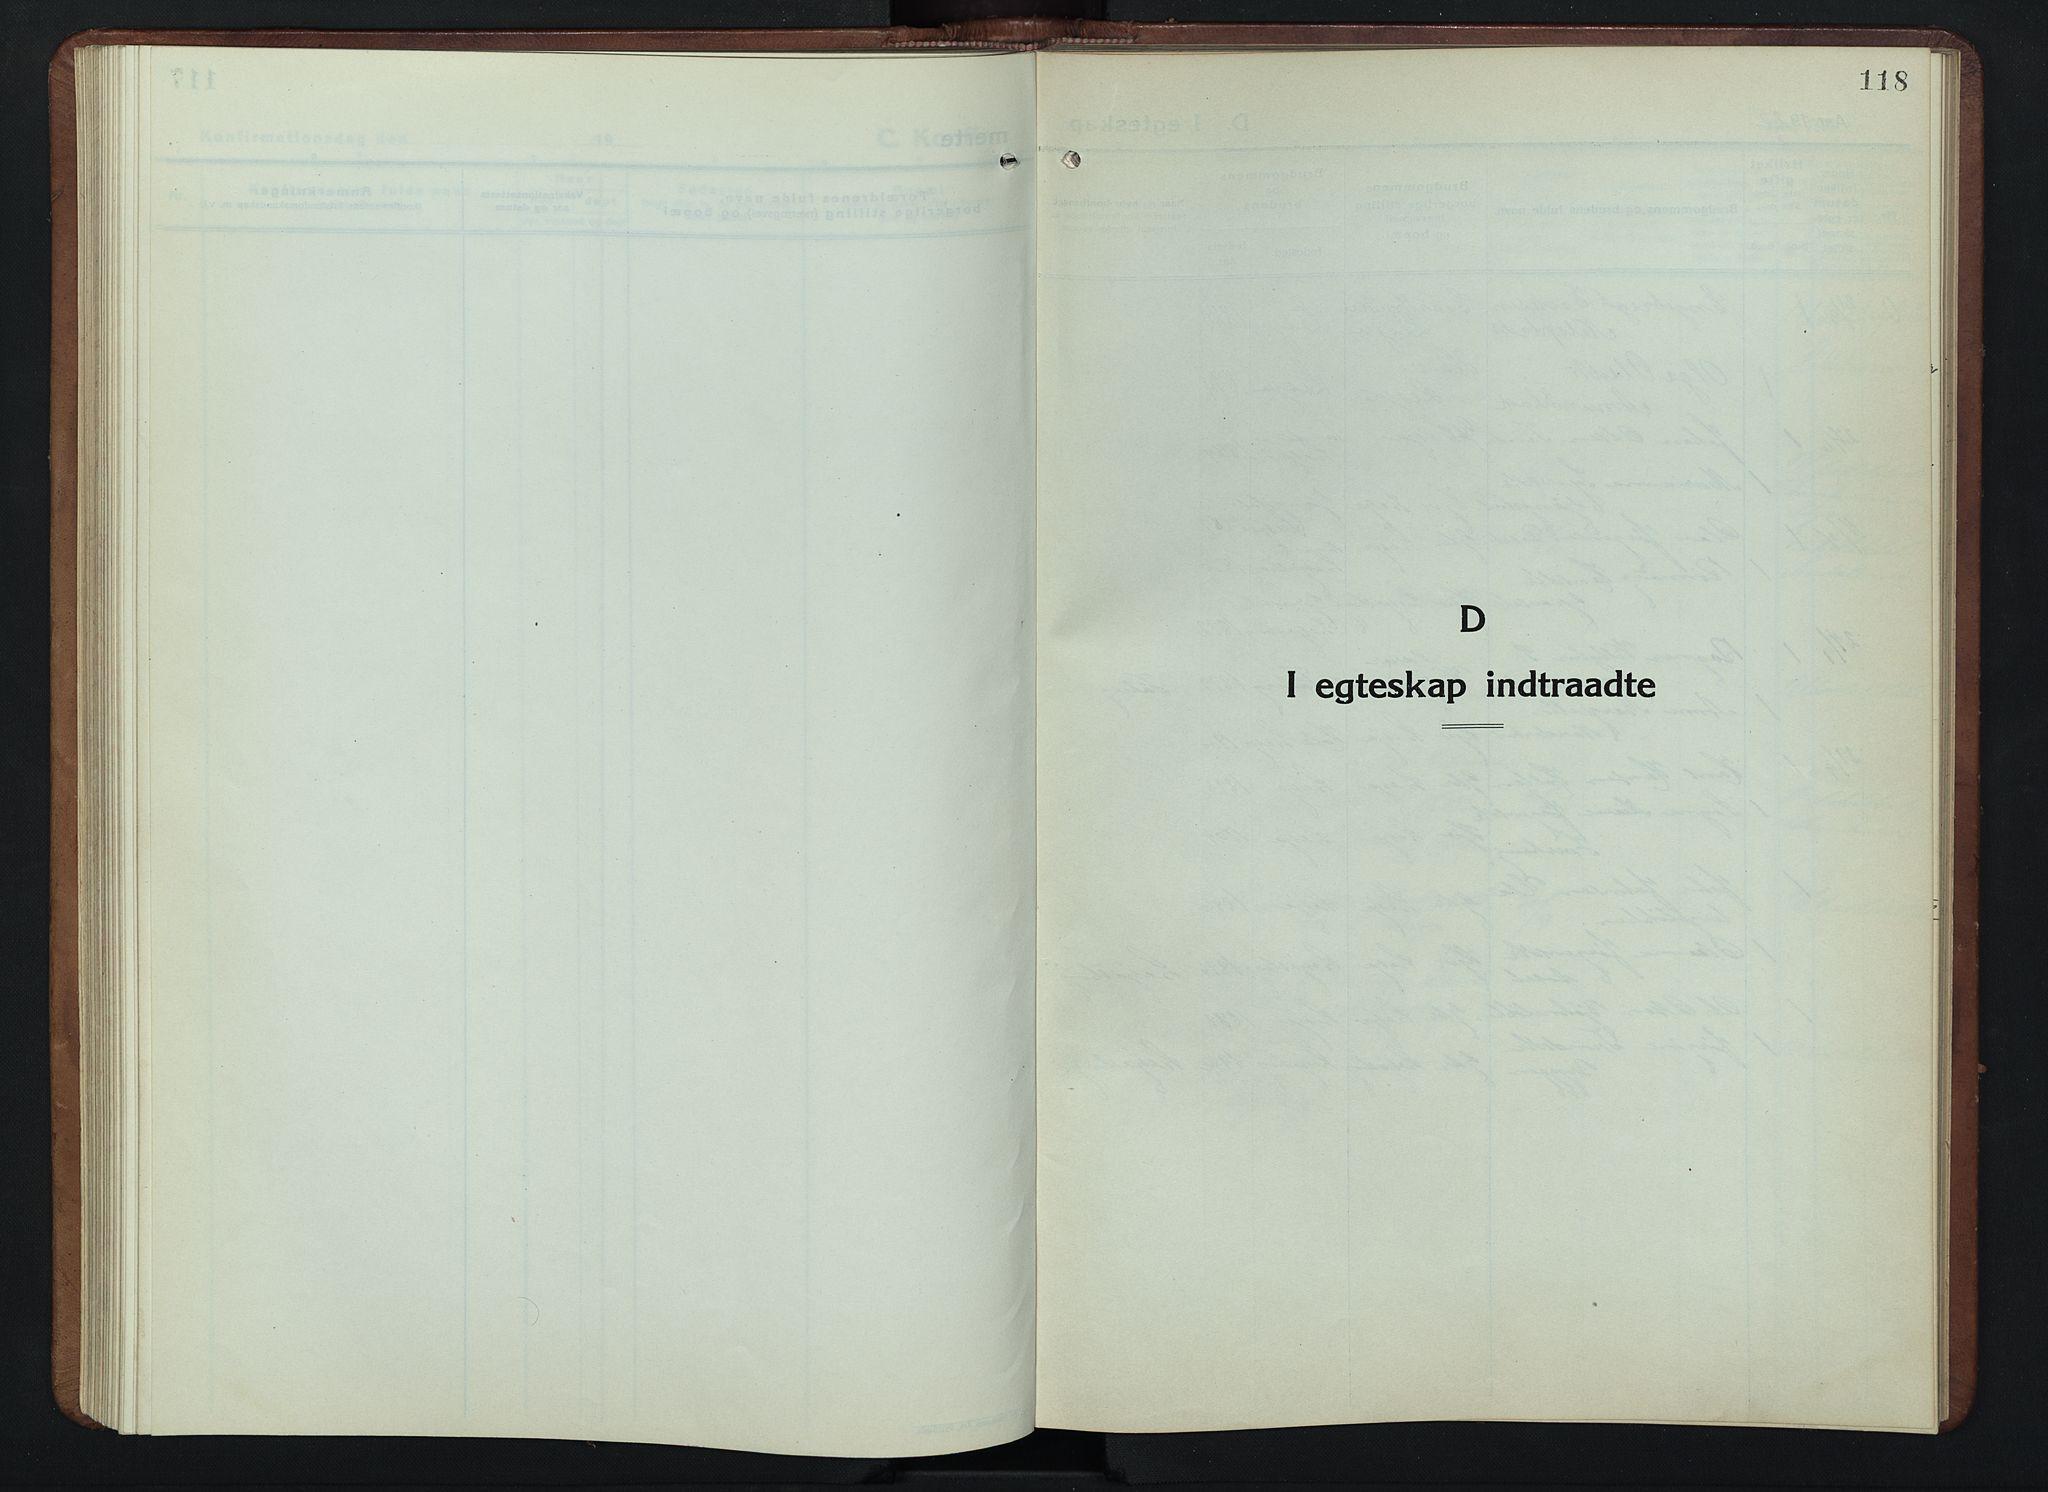 SAH, Lesja prestekontor, Klokkerbok nr. 9, 1924-1947, s. 118